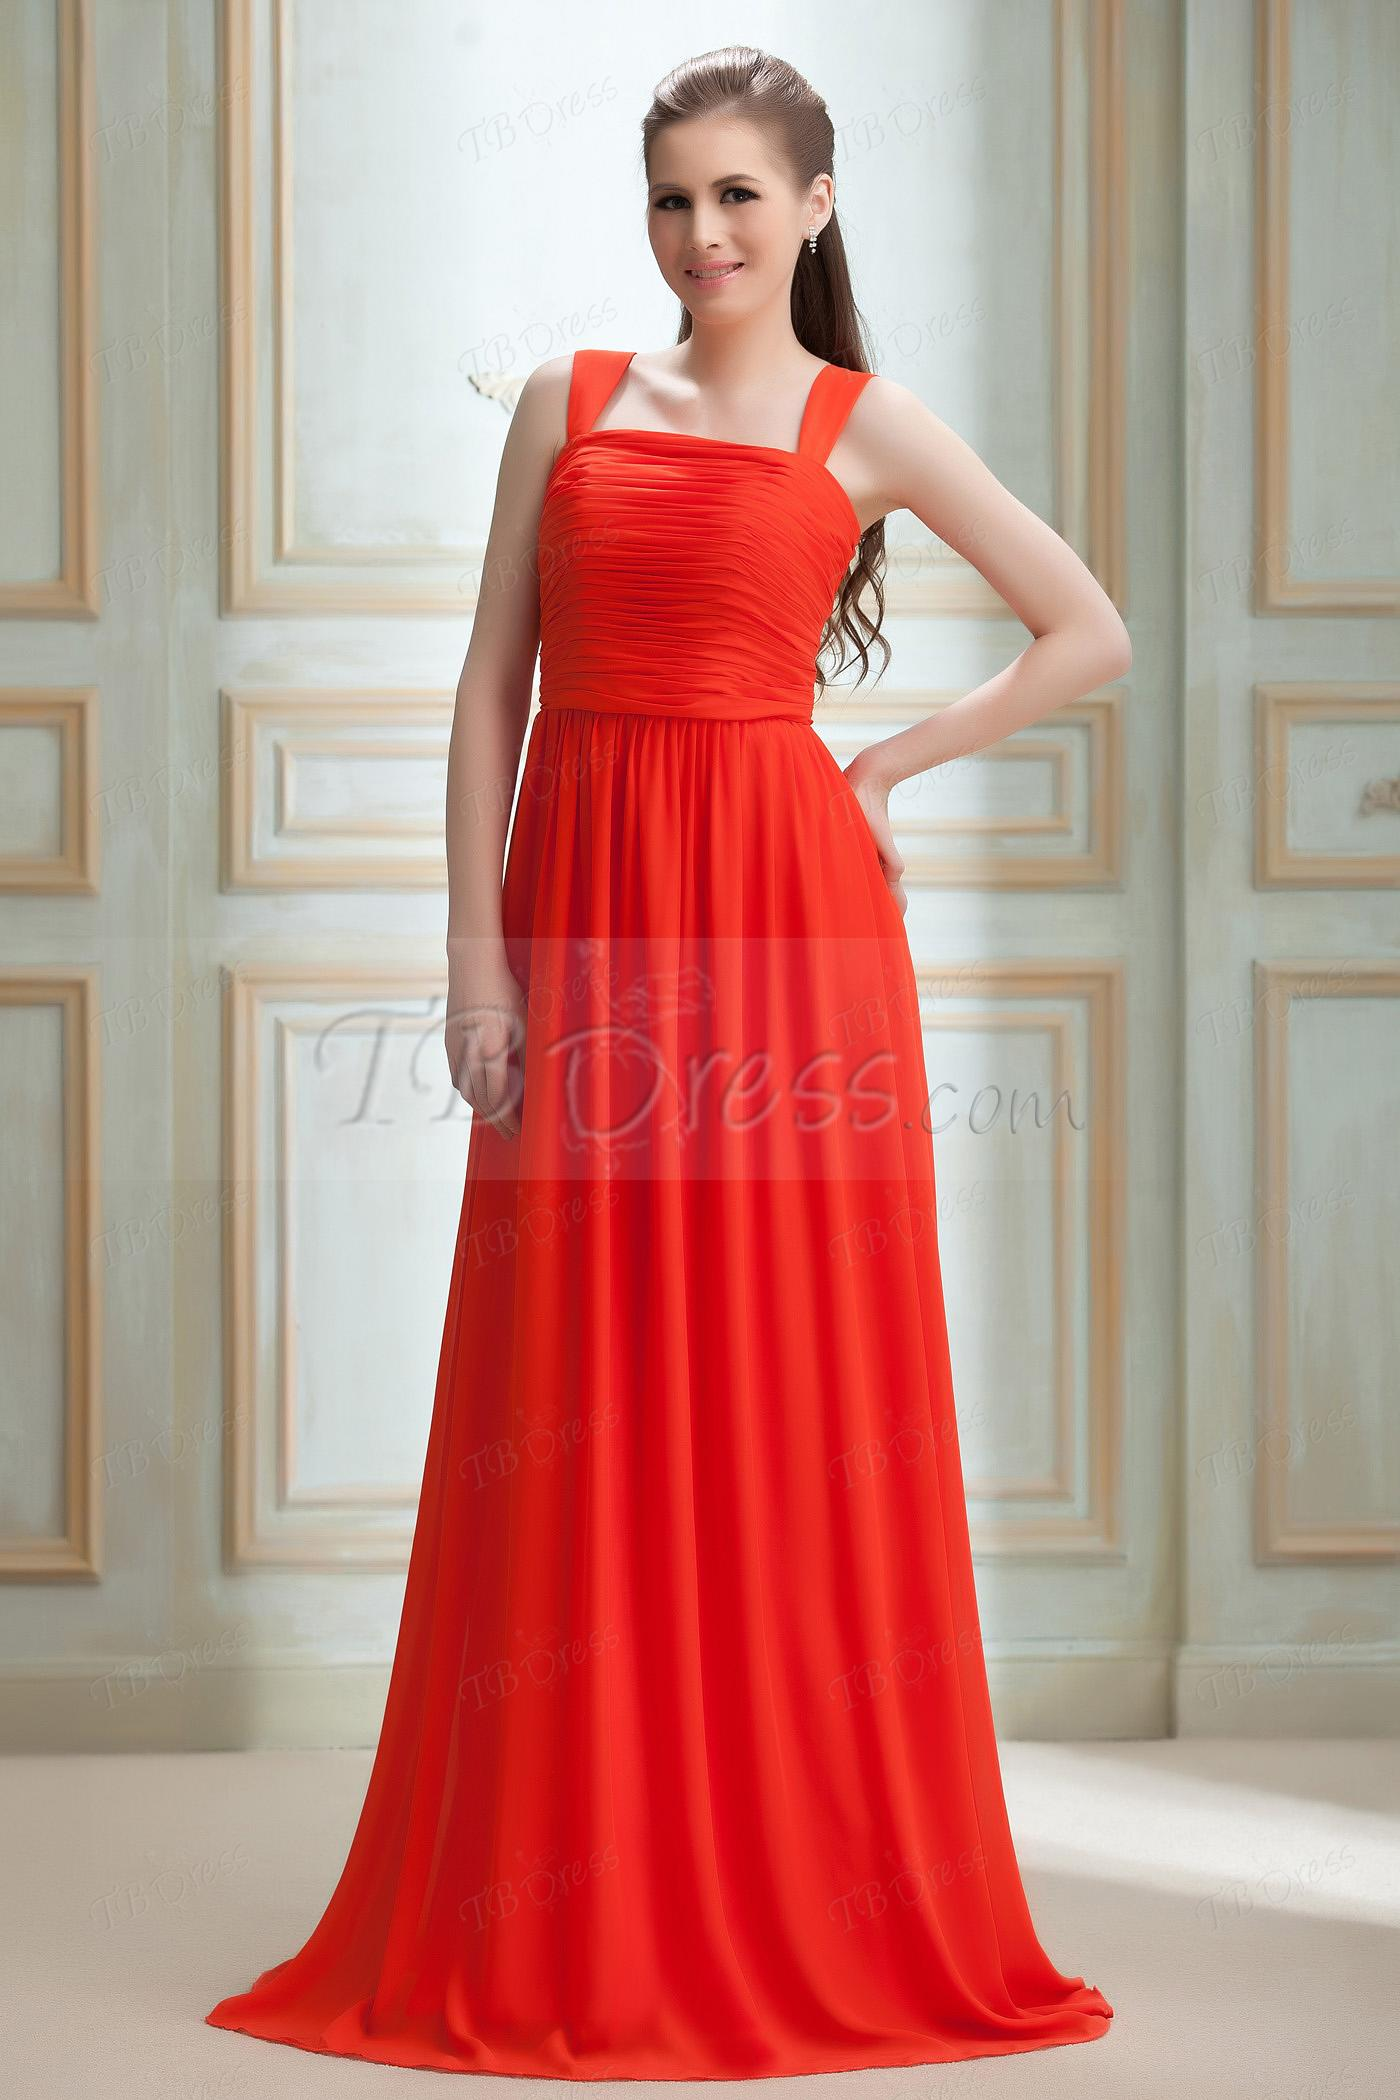 Choosing Dress To Wear To A Wedding 2013